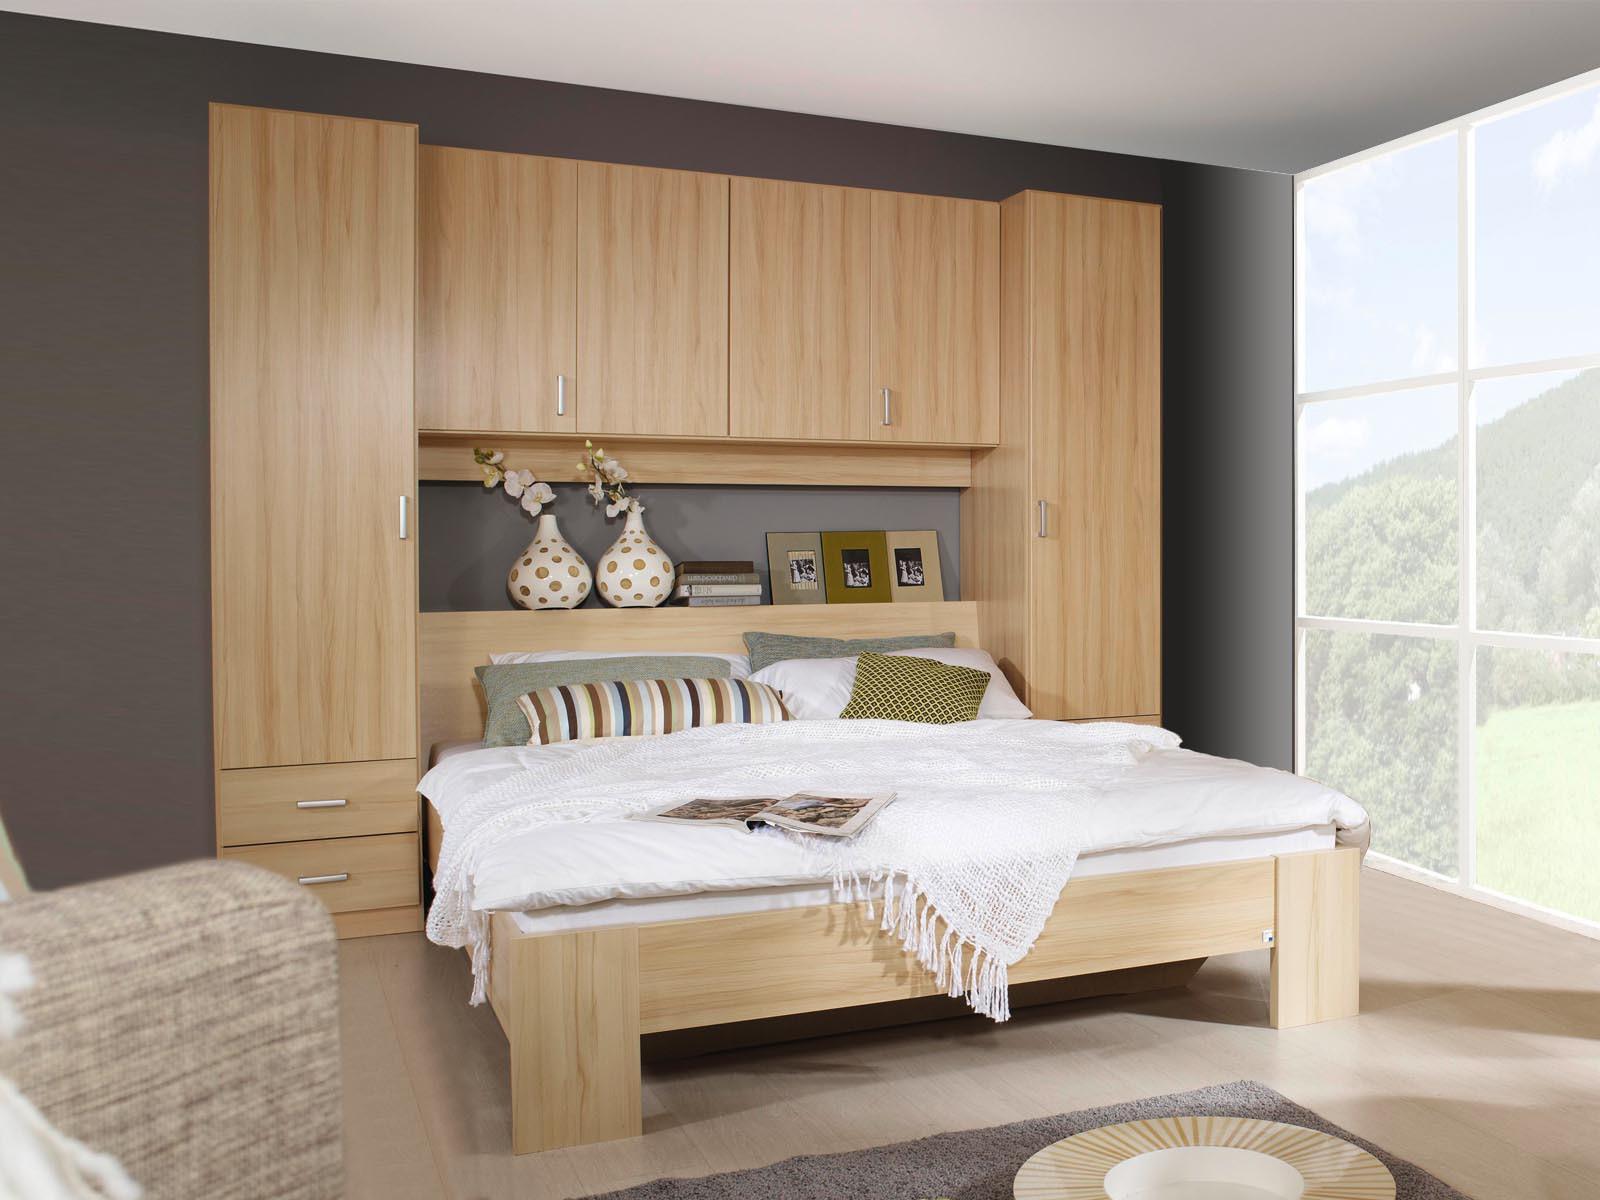 Tête De Lit Design Ikea Moderne Avec Rangement